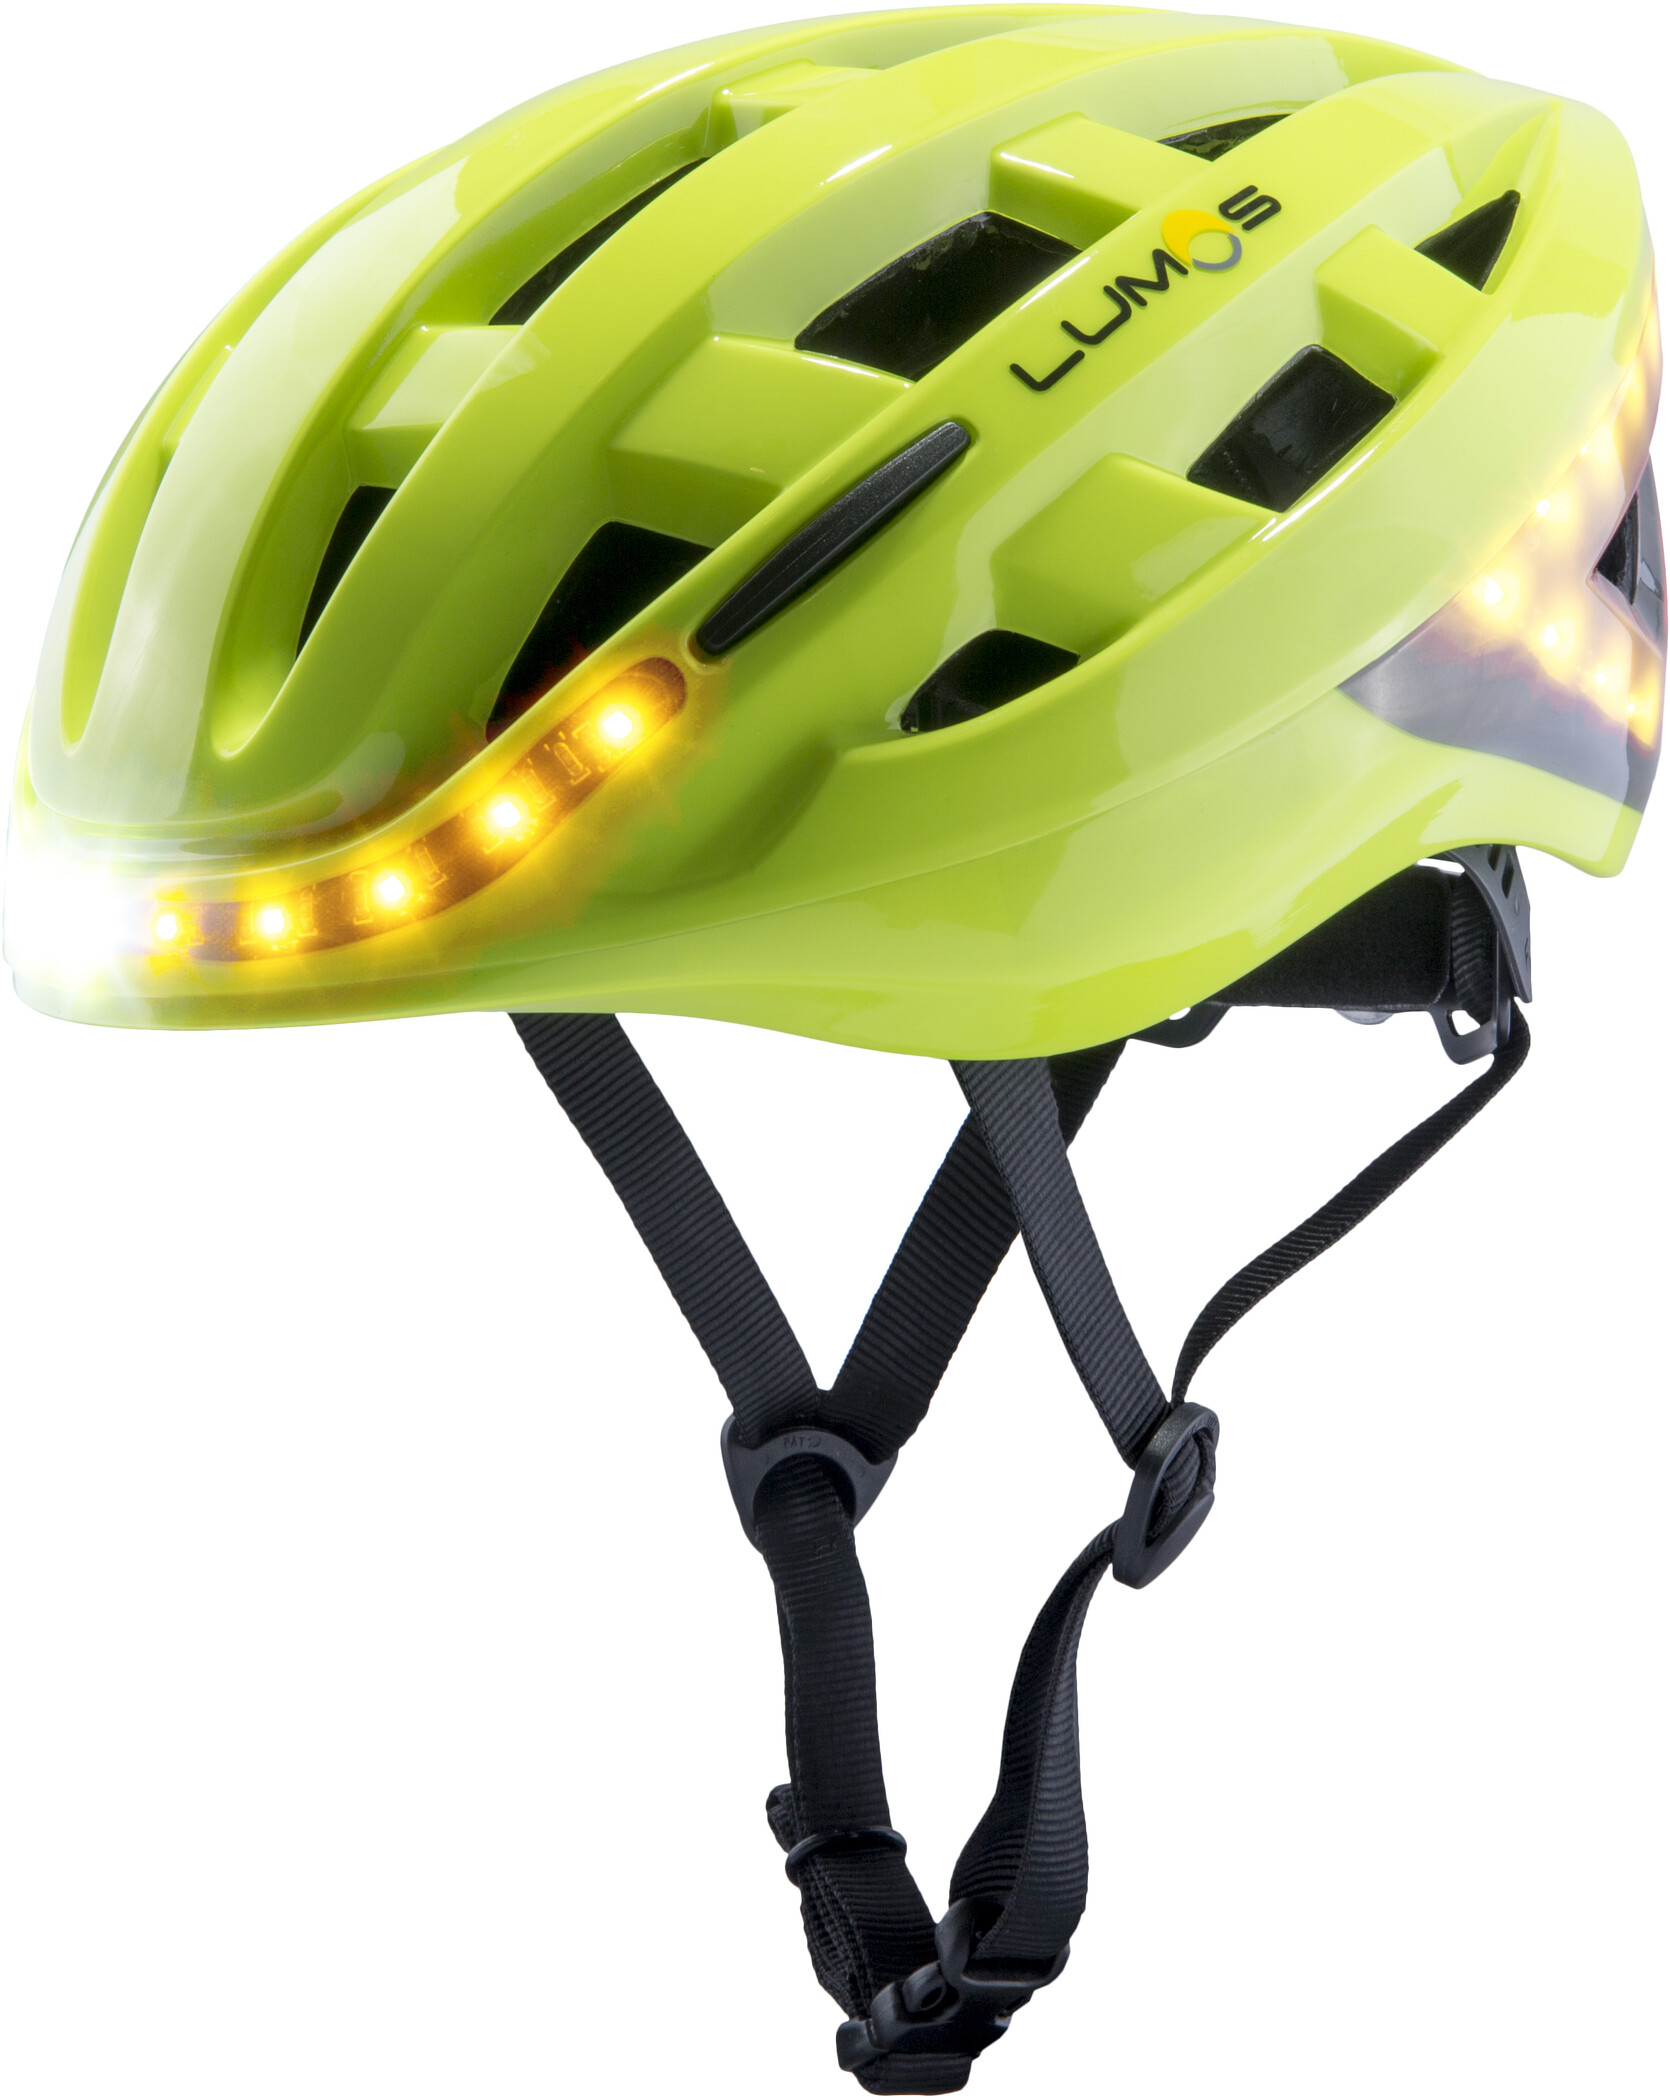 Lumos Kickstart Cykelhjelm, electric lime (2020) | Helmets